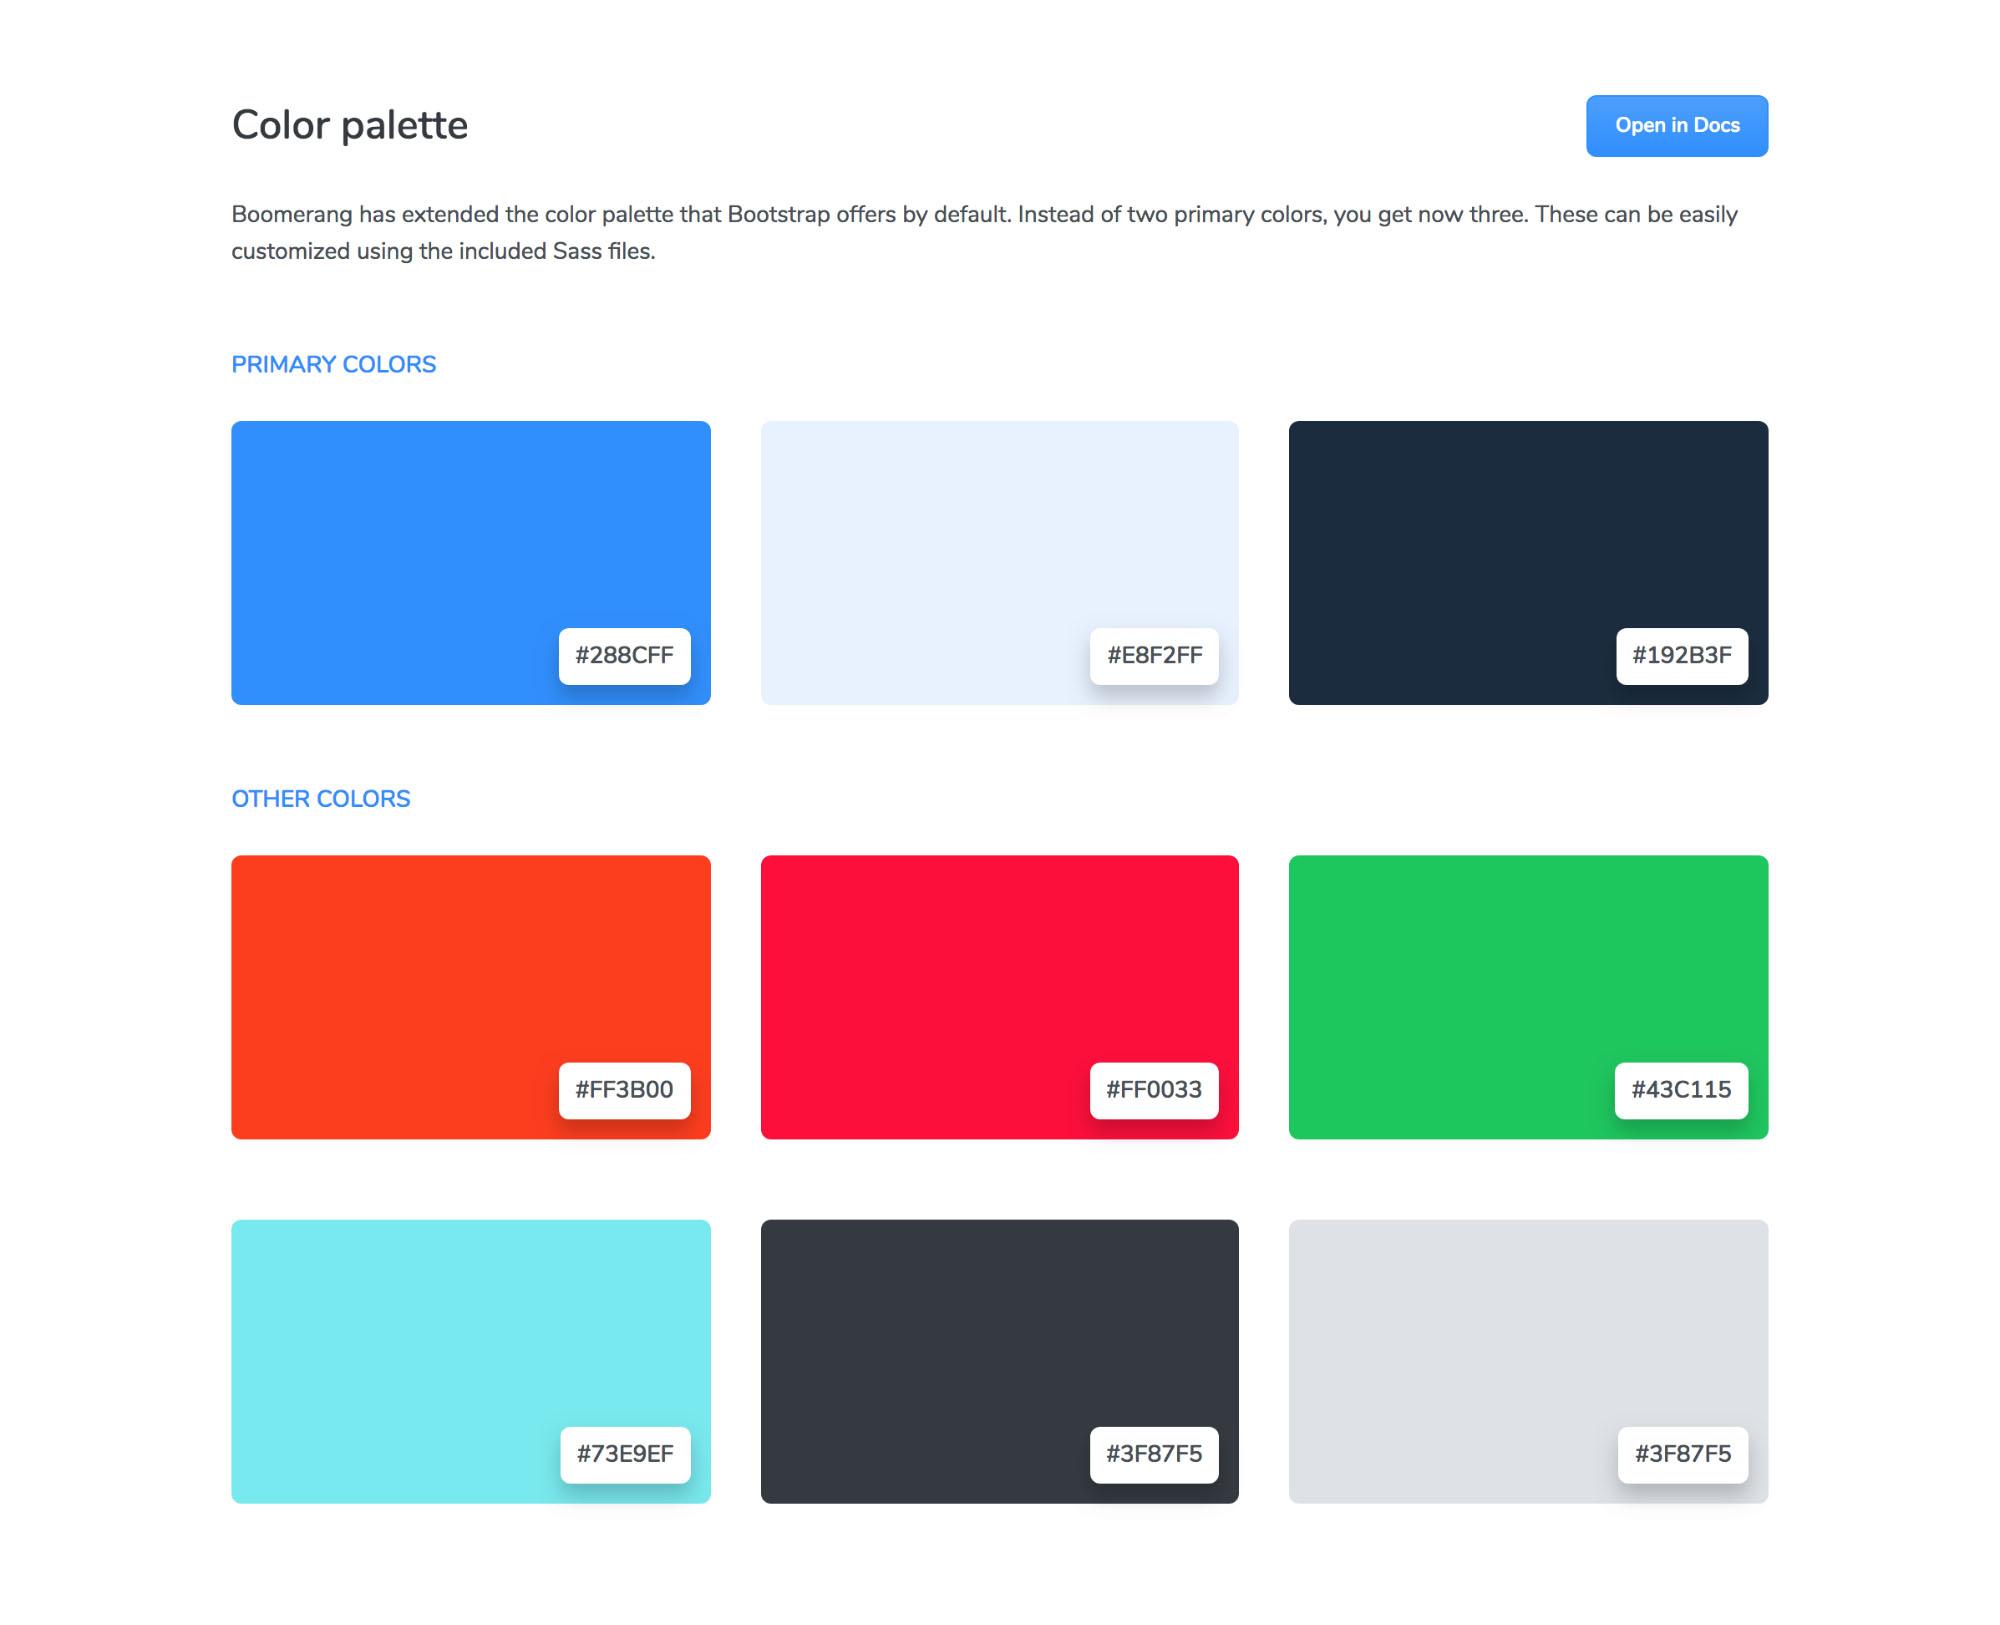 Boomerang Html Ui Kit - Color Palette